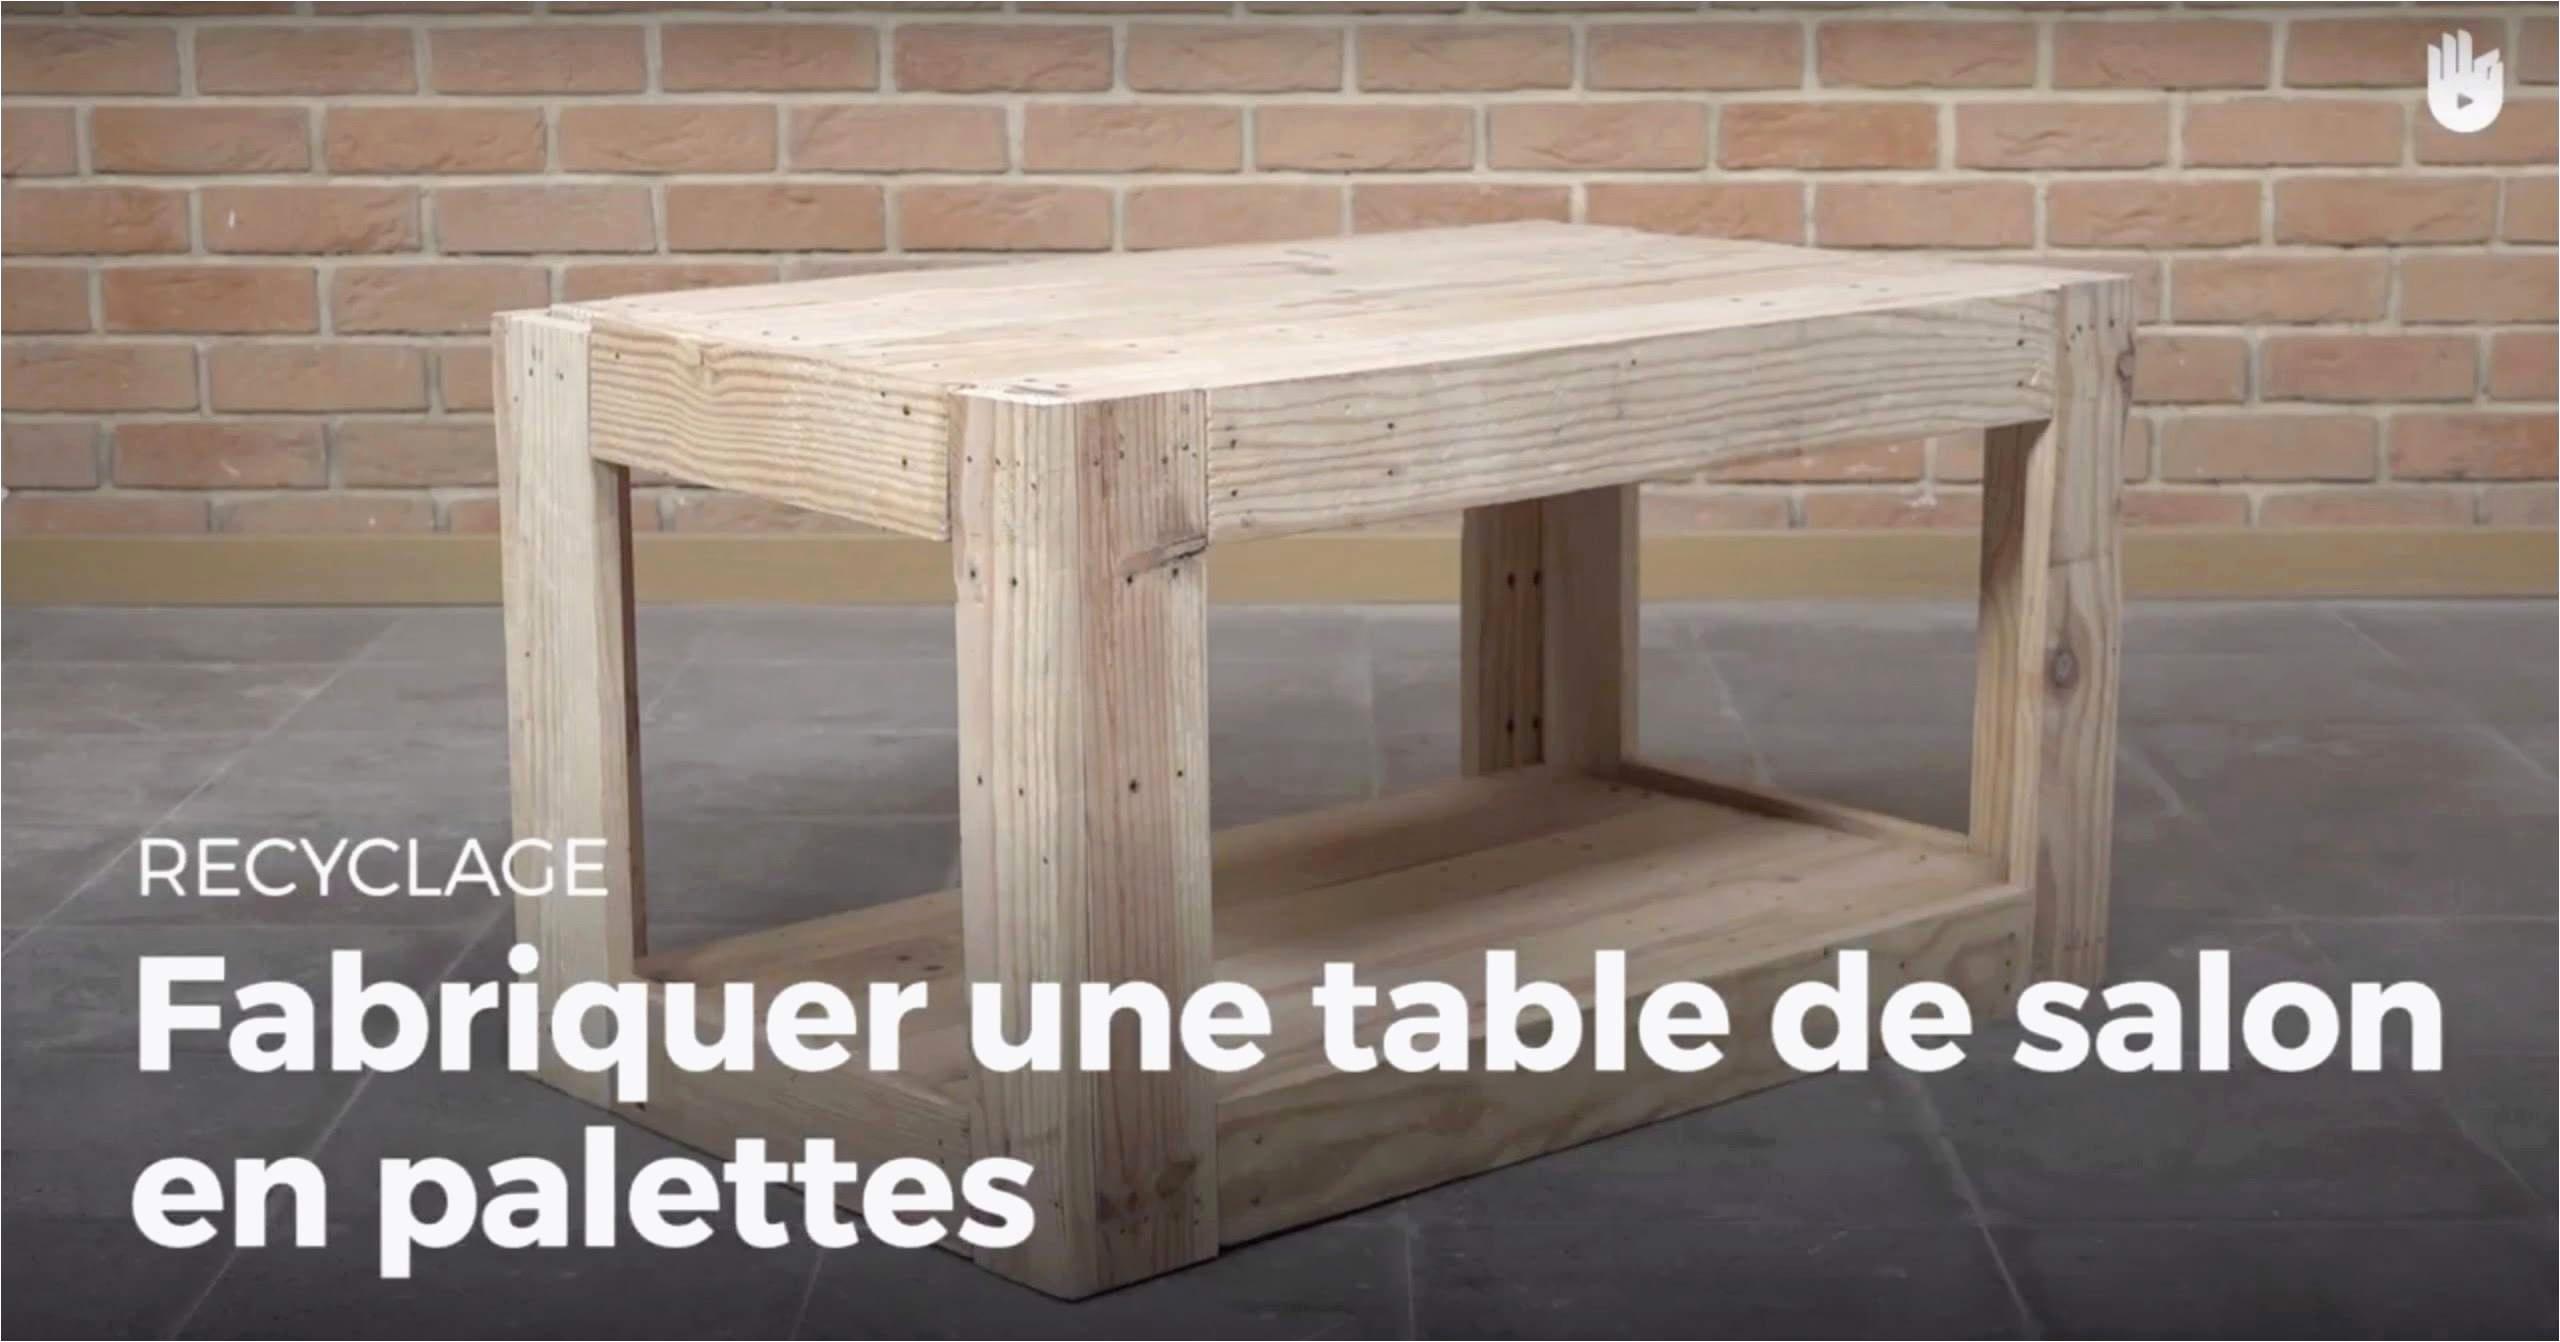 Table De Jardin Alinea Élégant Images Table Salon Alinea Génial Alinea Cuisine Equipee Inspirant Chaise